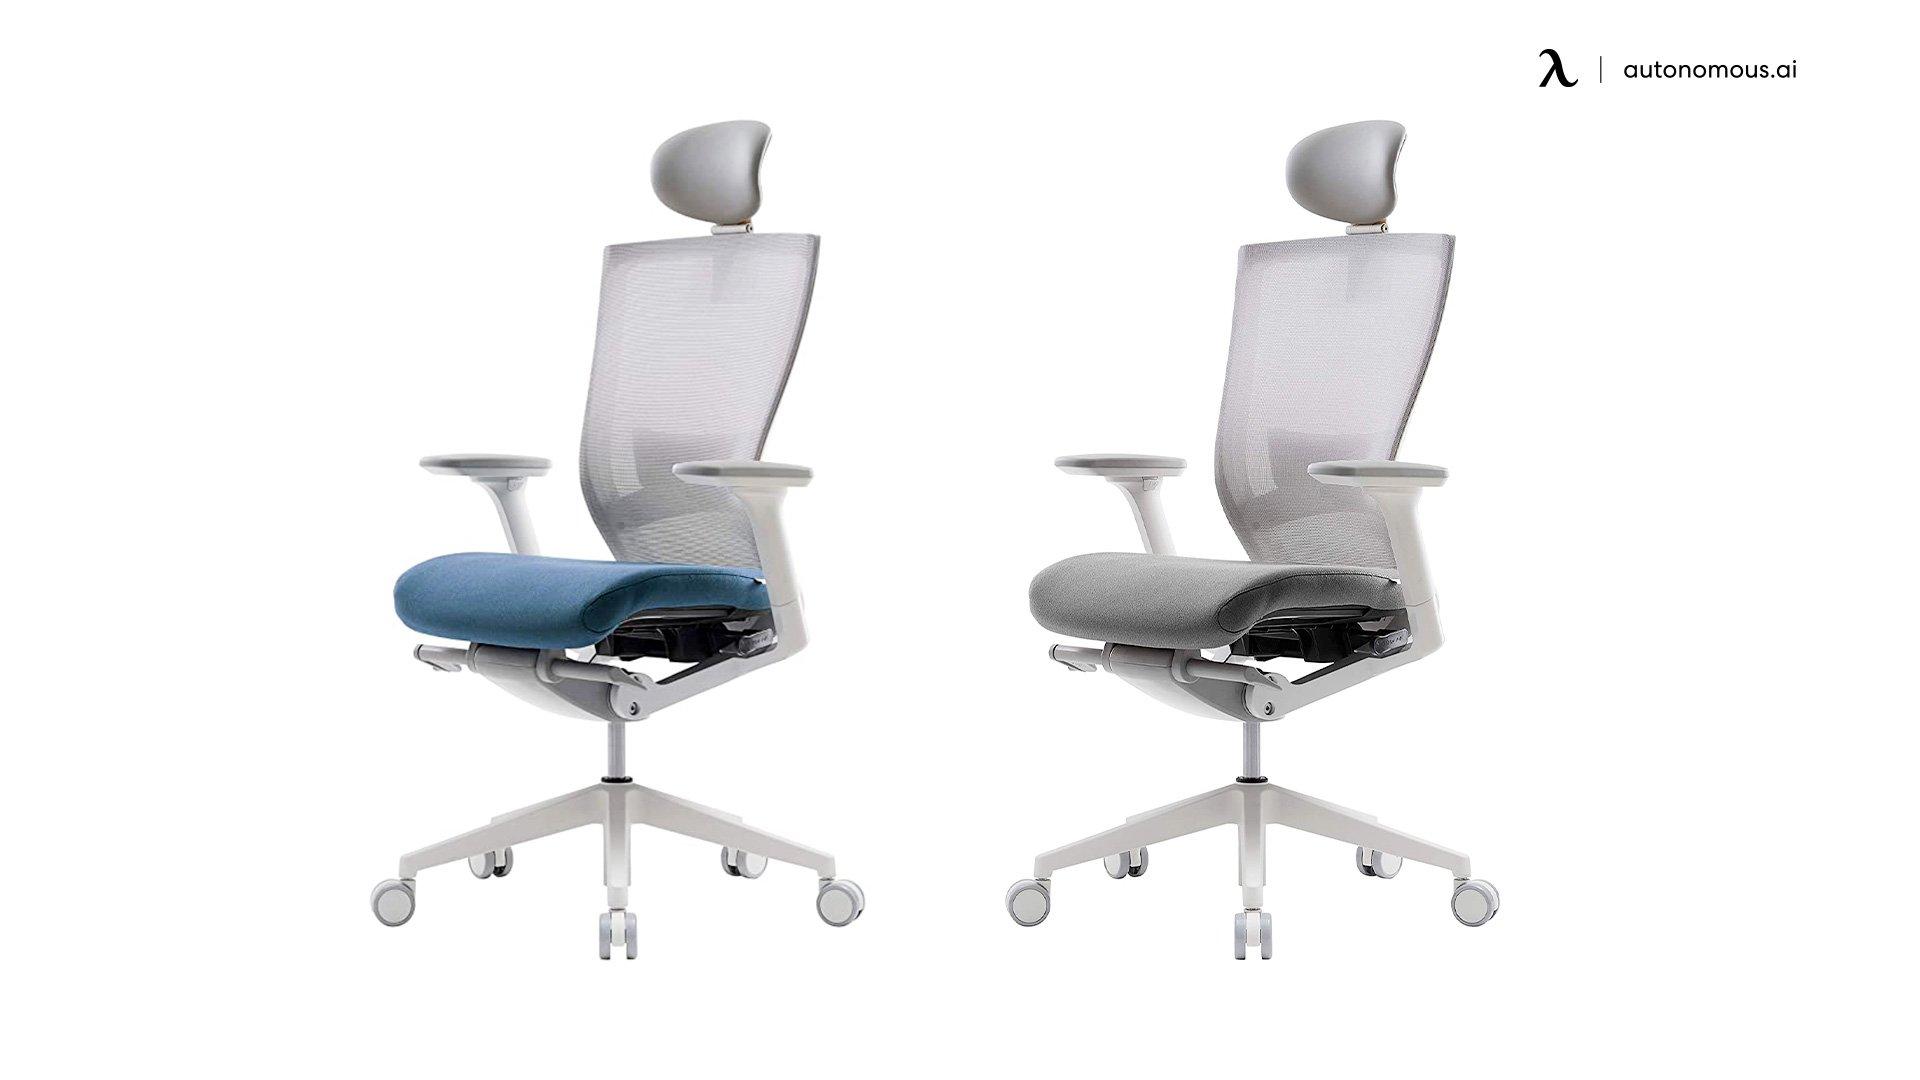 Sidiz T50 Chair